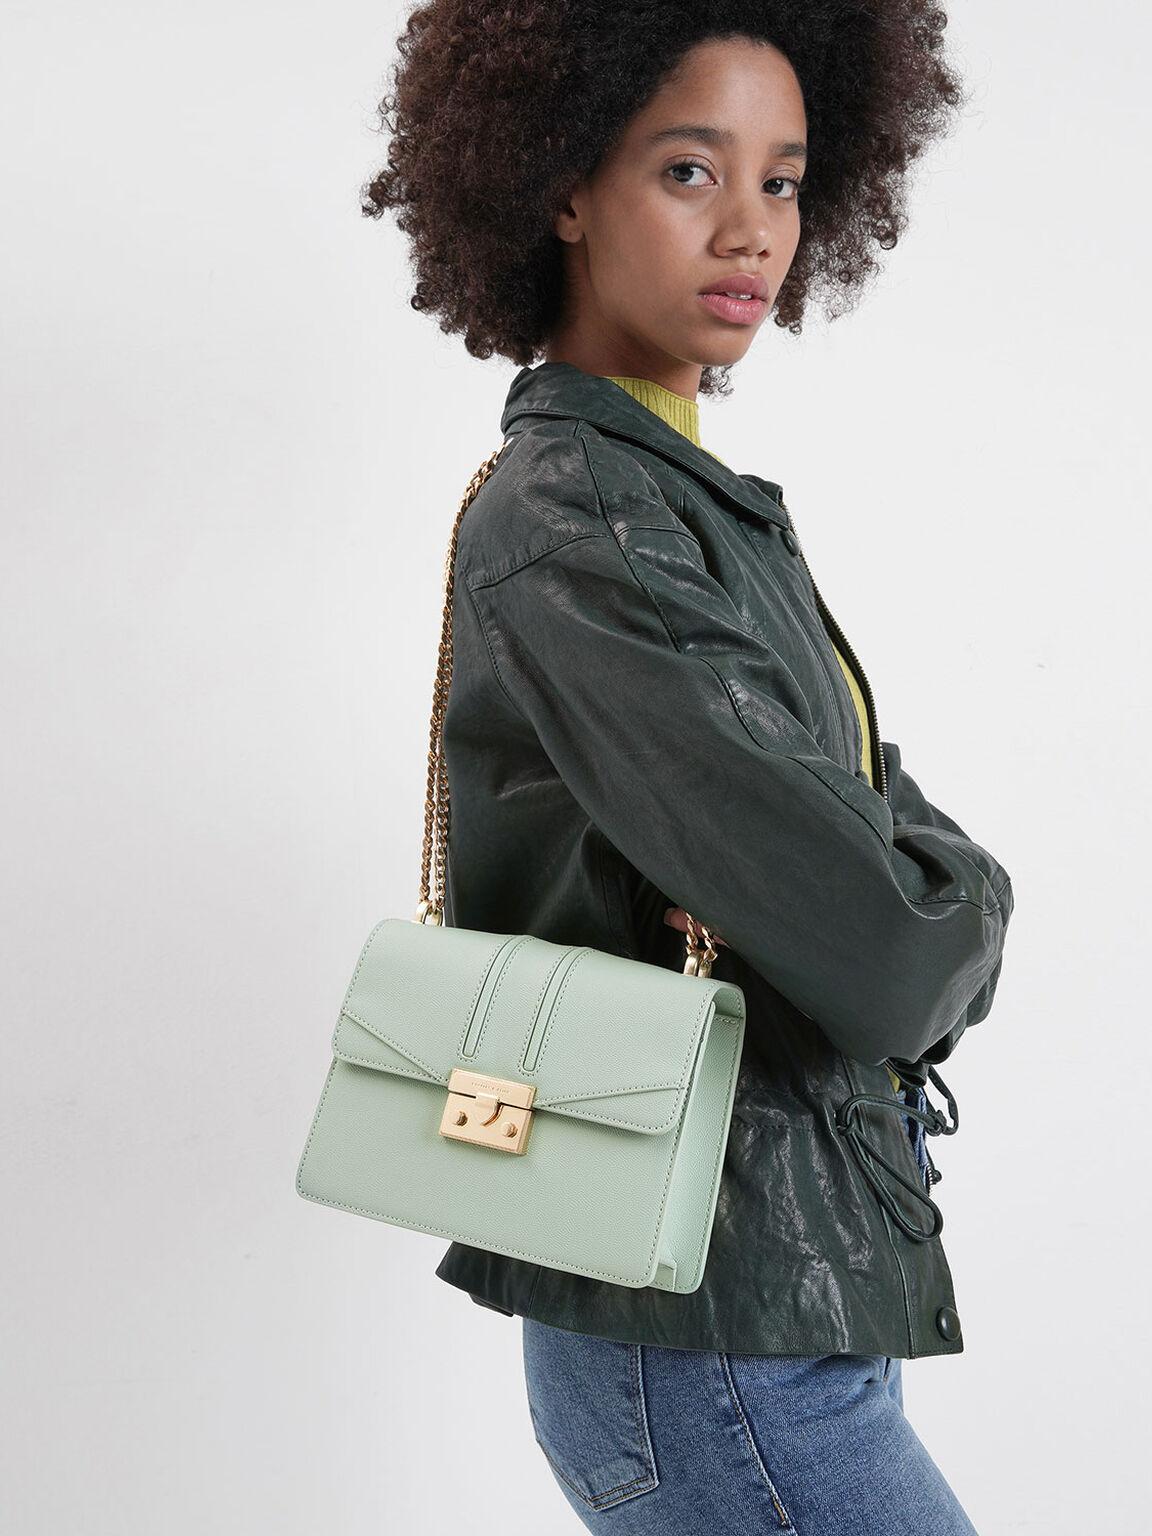 Chain Strap Shoulder Bag, Mint Green, hi-res